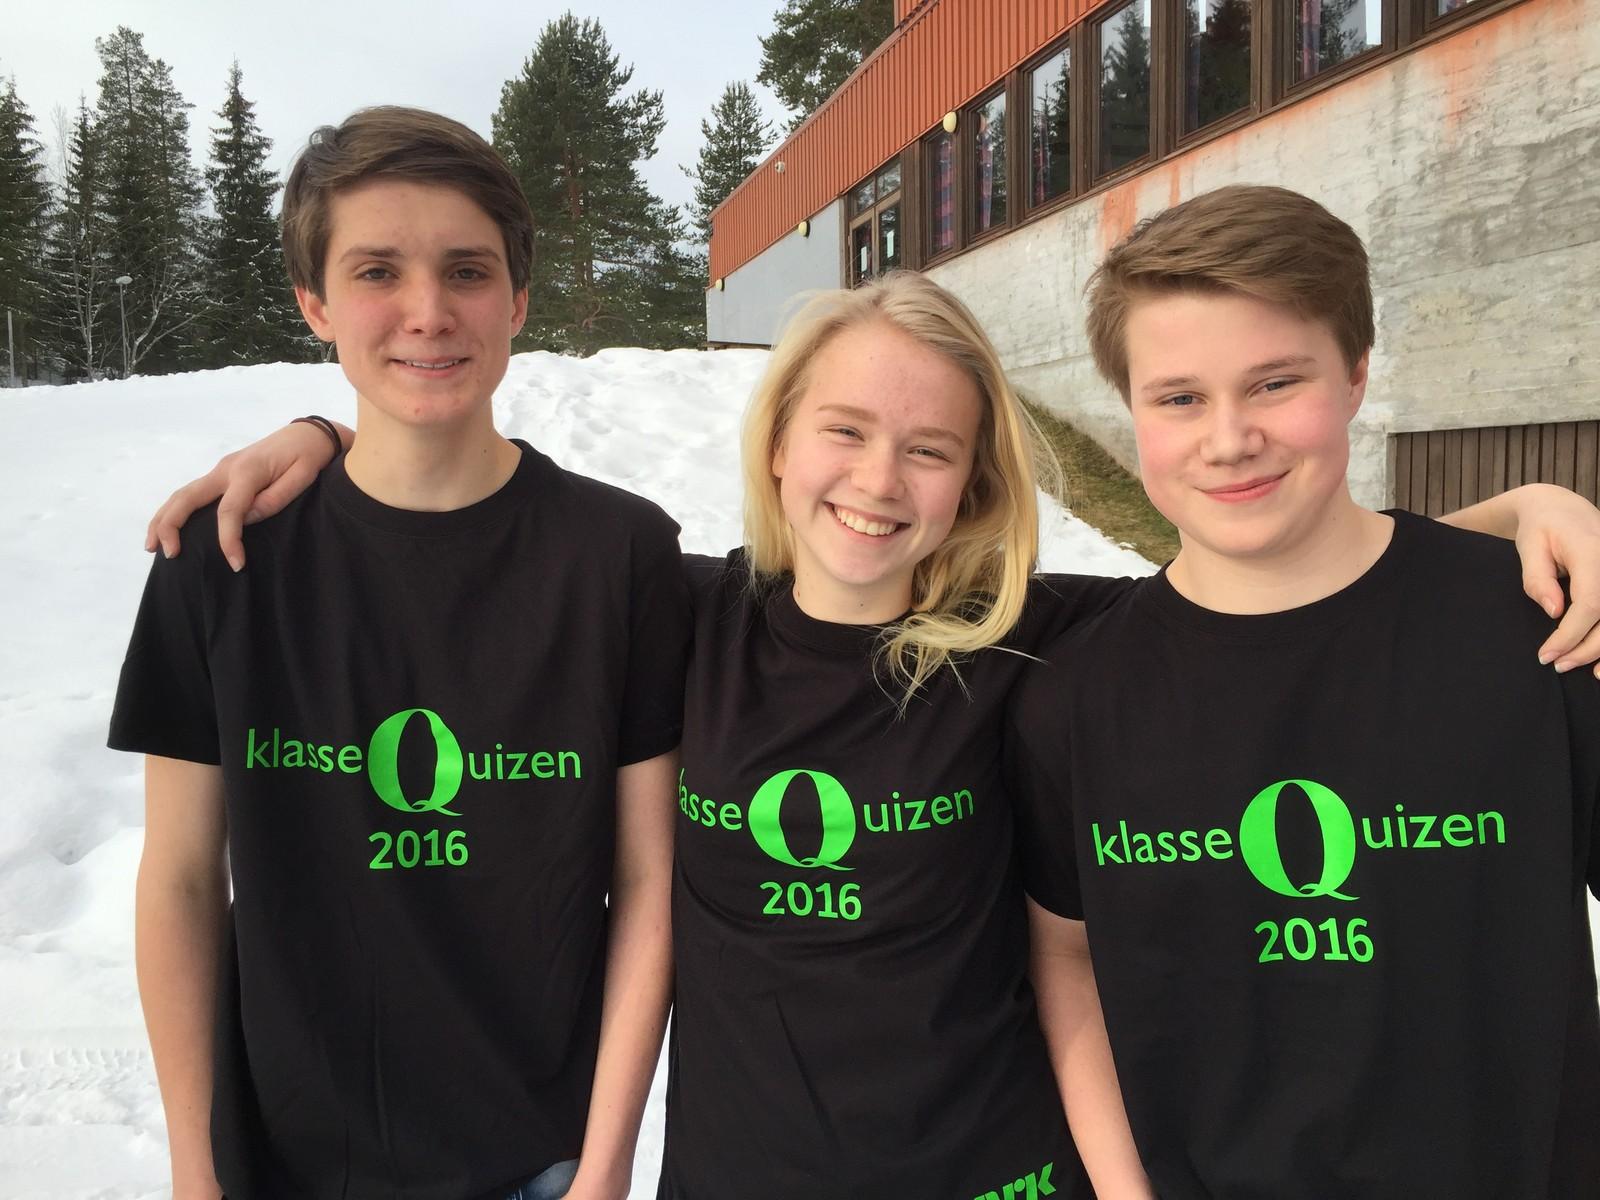 Morten Pedersen Hauger, Thea Fløistad Uvaas og Oscar Fjeld ved Raufoss ungdomsskole fikk fem poeng.